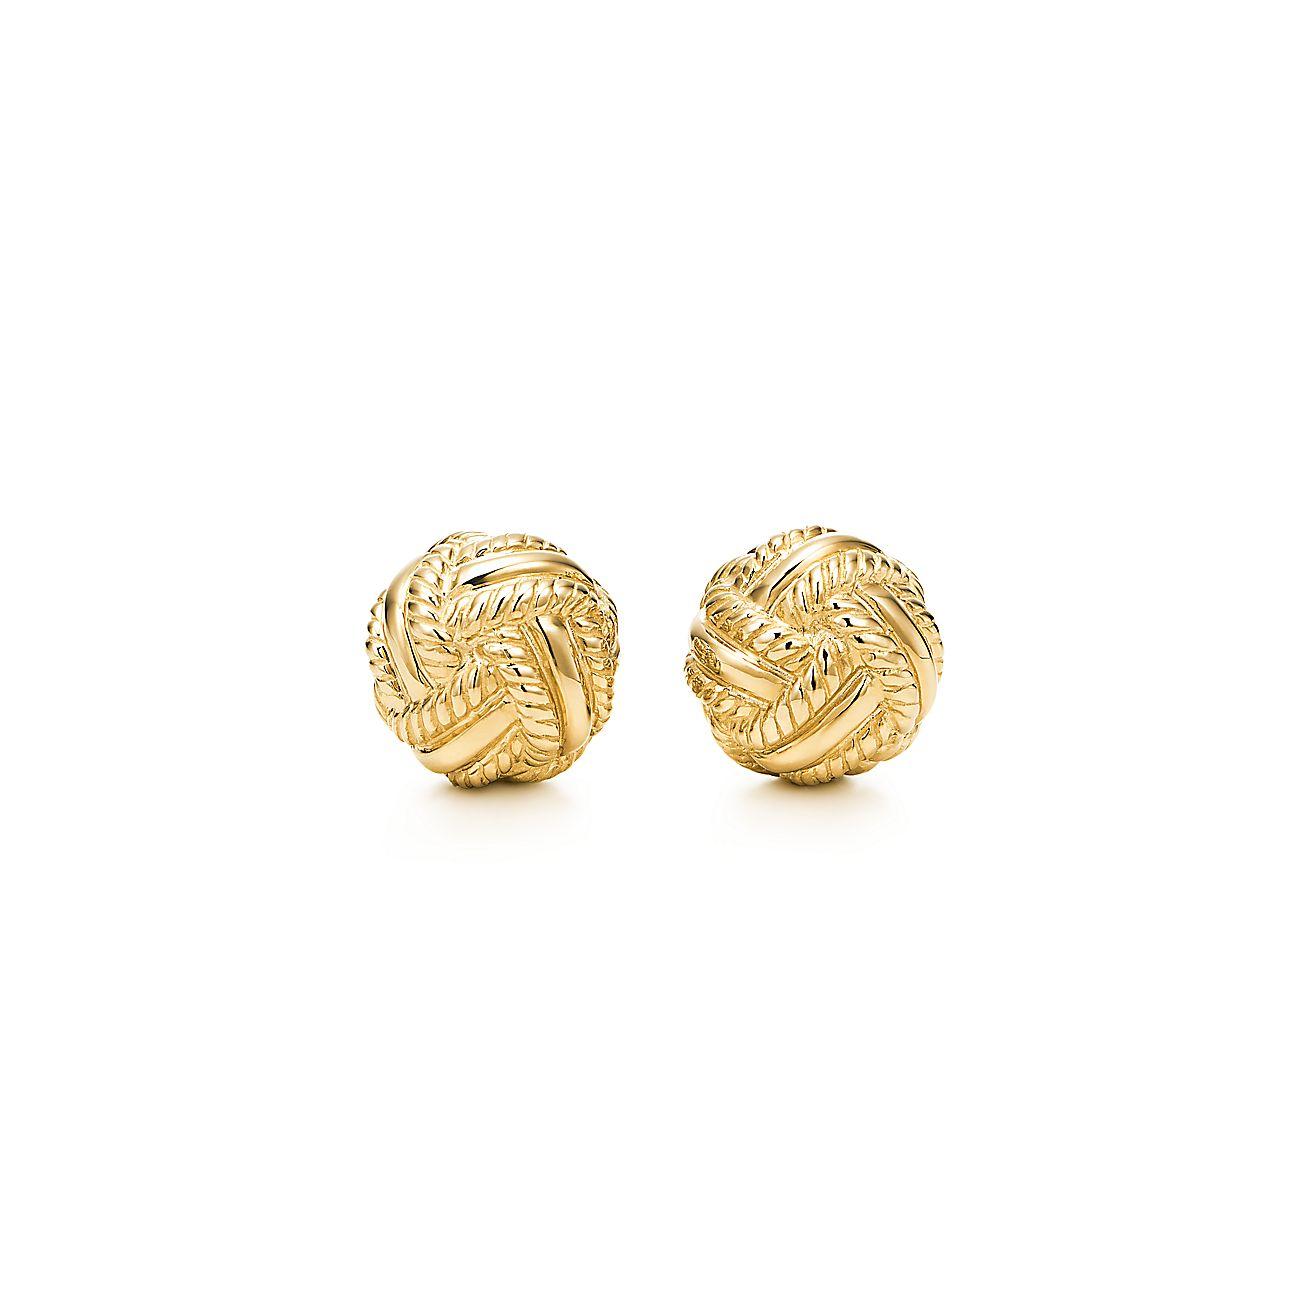 Tiffany & Co. Schlumberger®:Love Knot Earrings